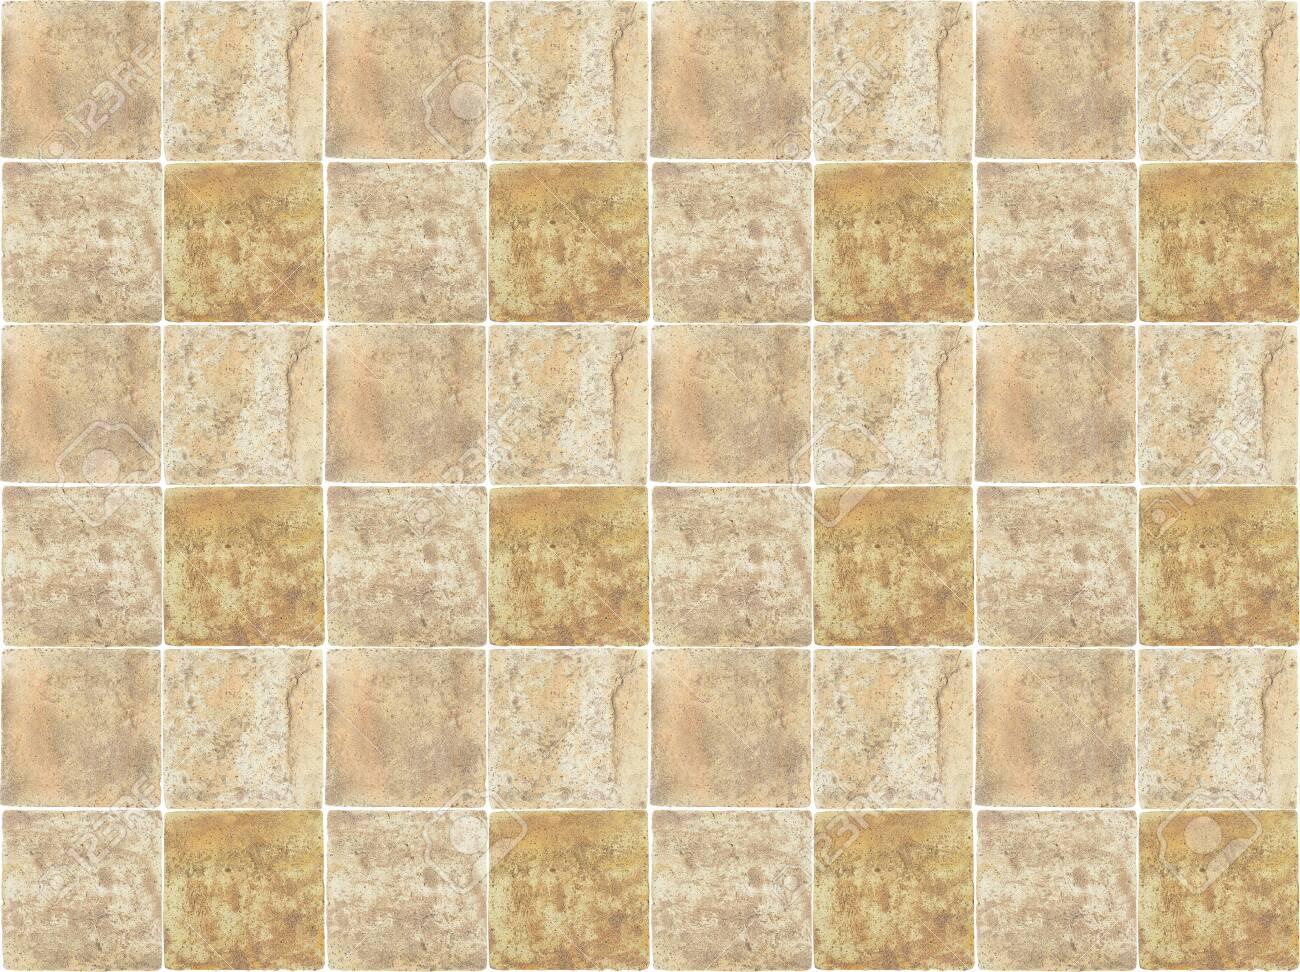 dirty brown ceramic floor tile texture background